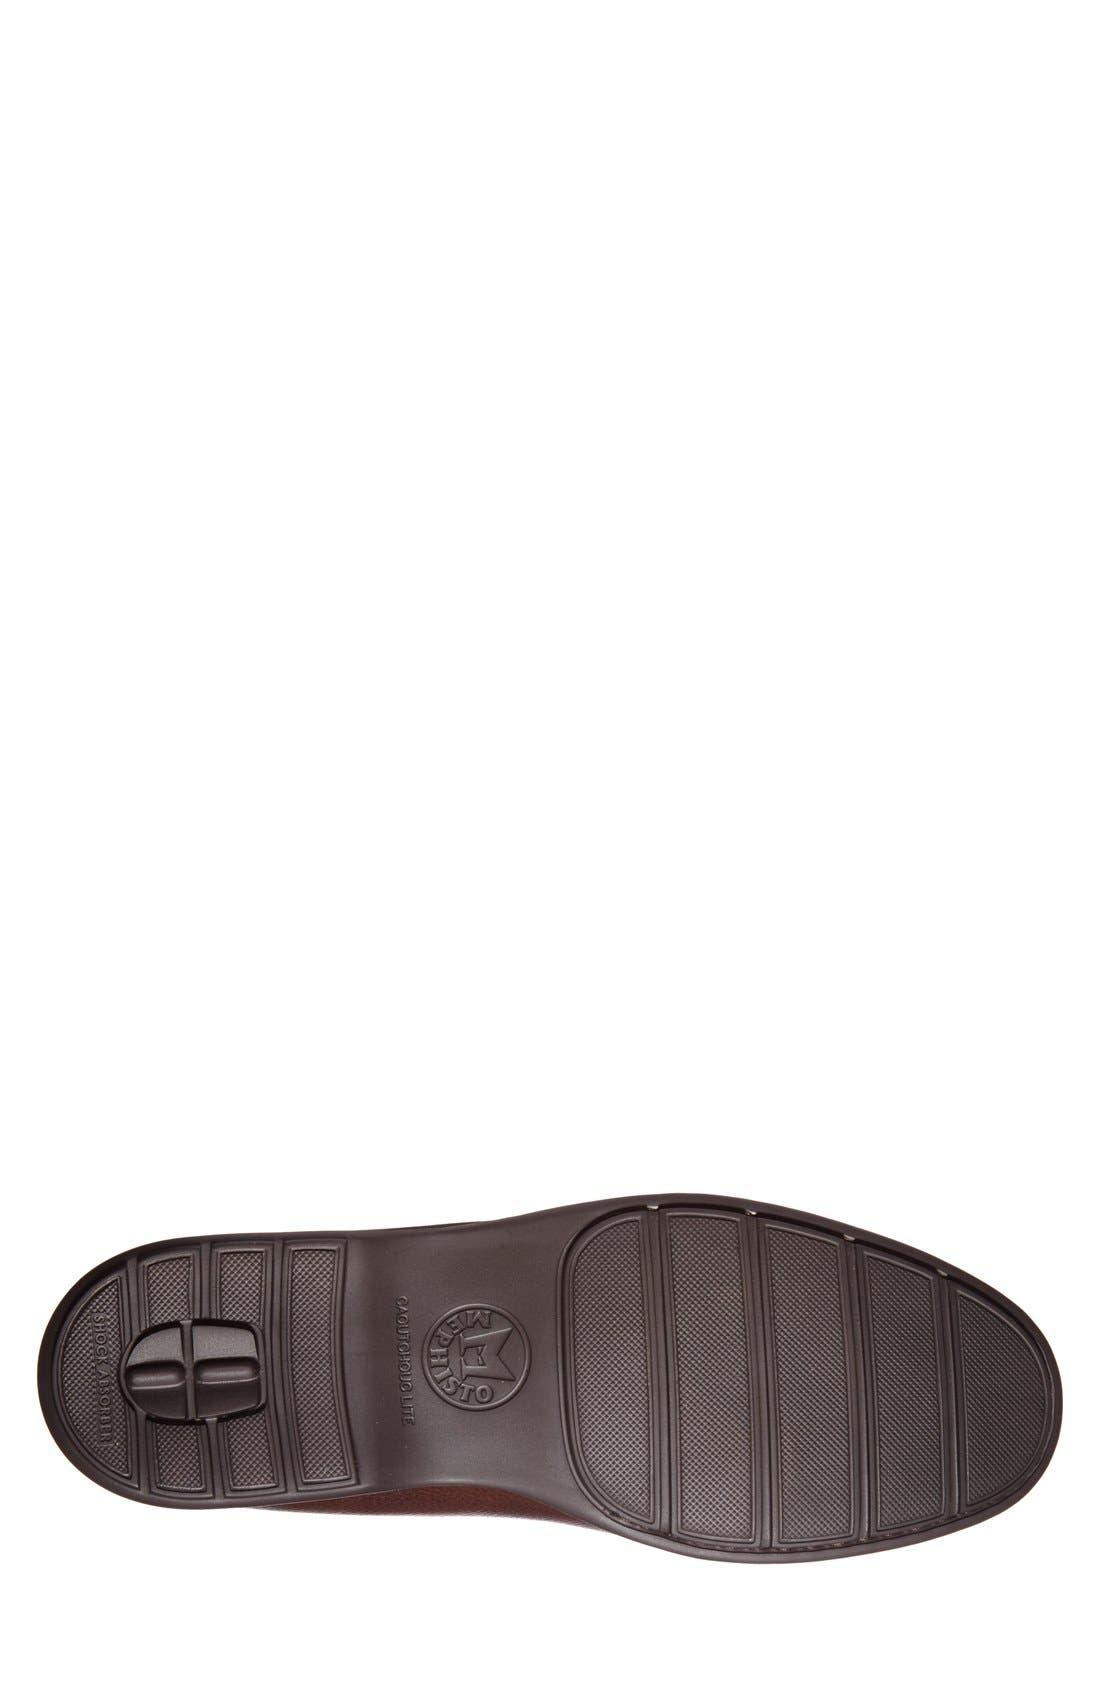 'Henri' Loafer,                             Alternate thumbnail 4, color,                             Chestnut Leather